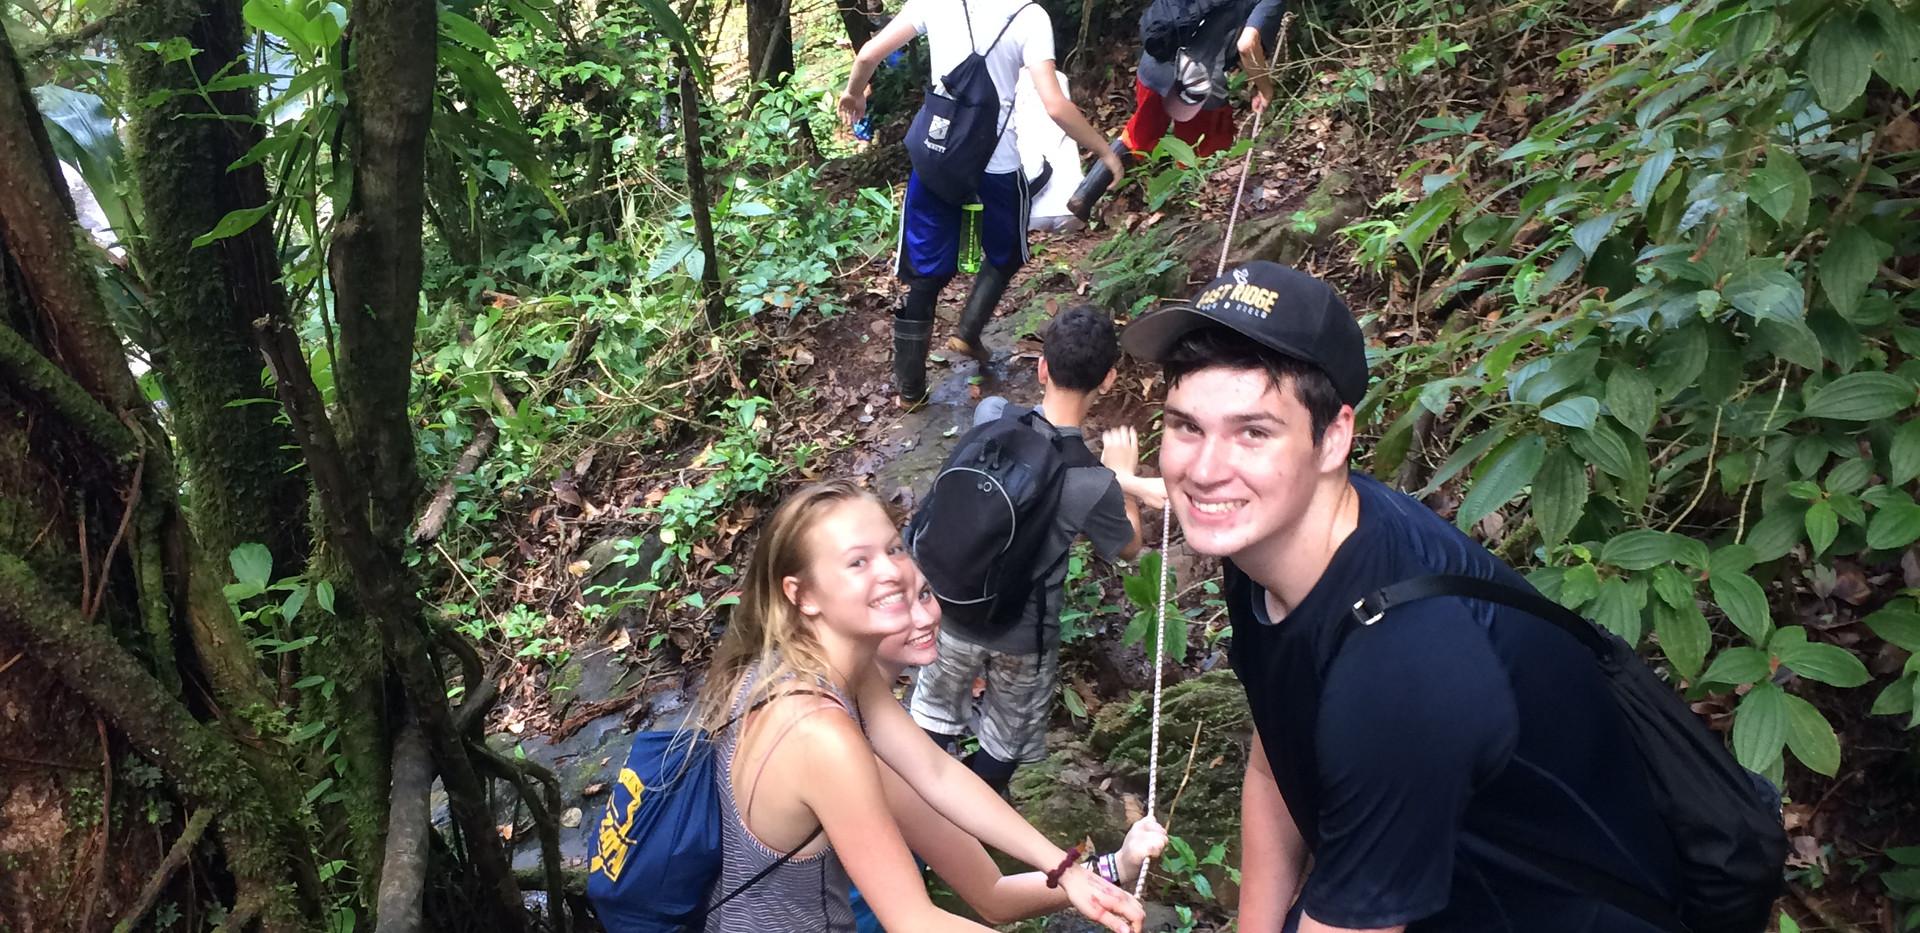 SOC rainforest hike